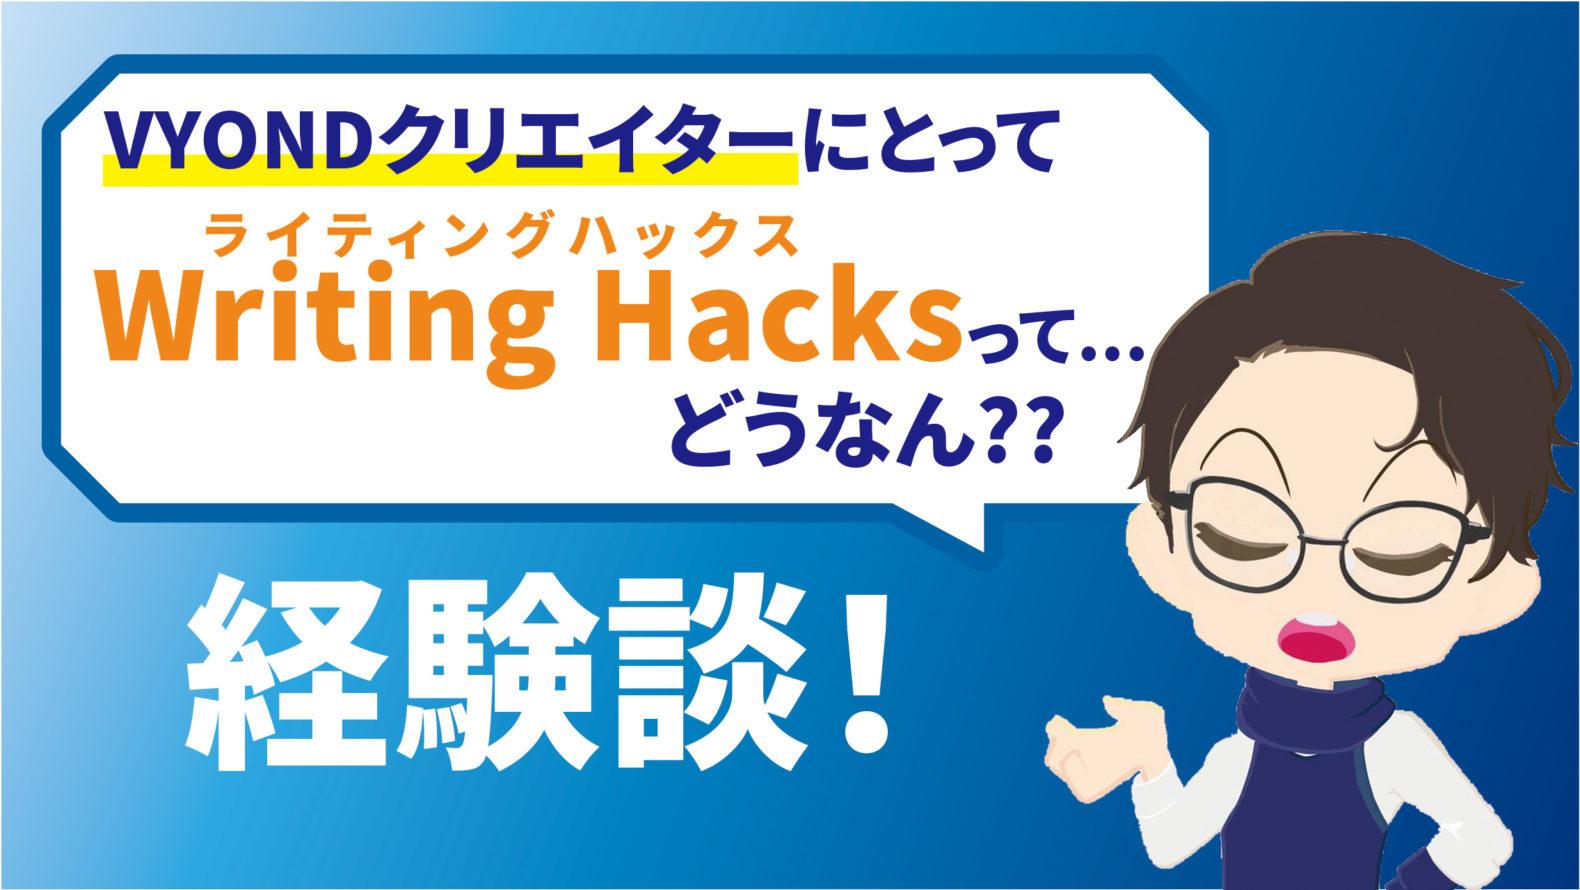 WritingHacks